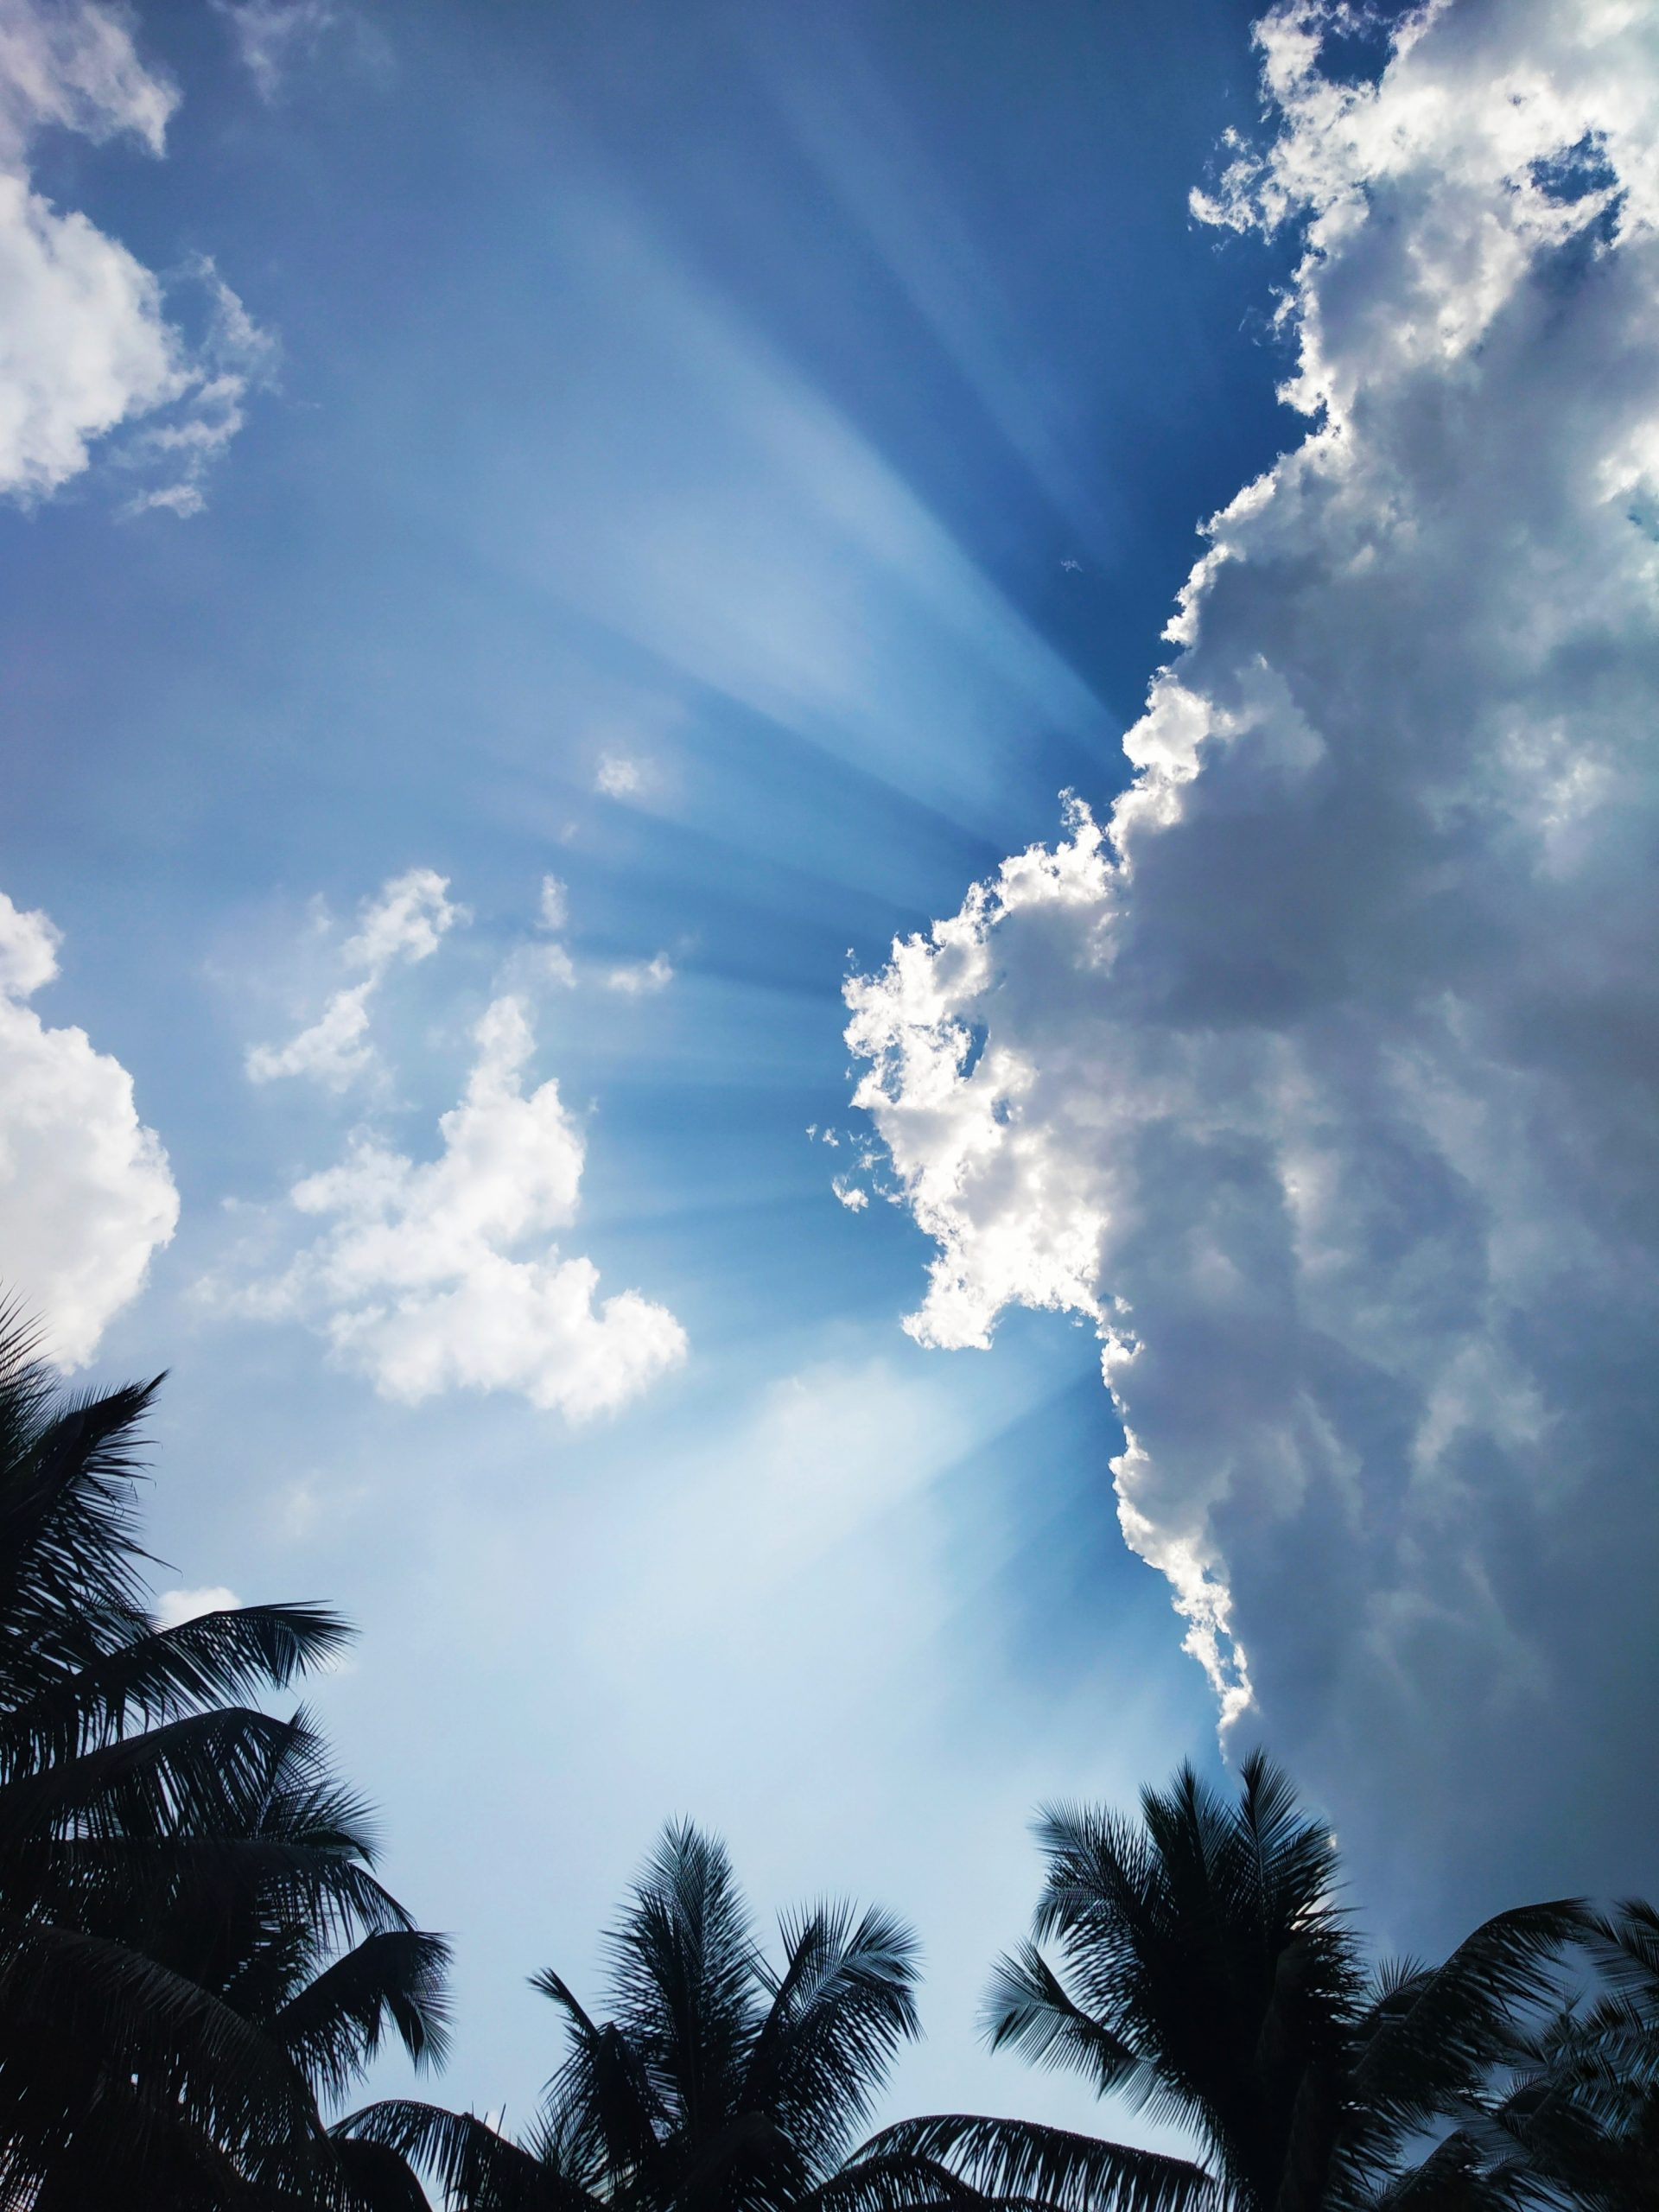 sun rays shining behind clouds